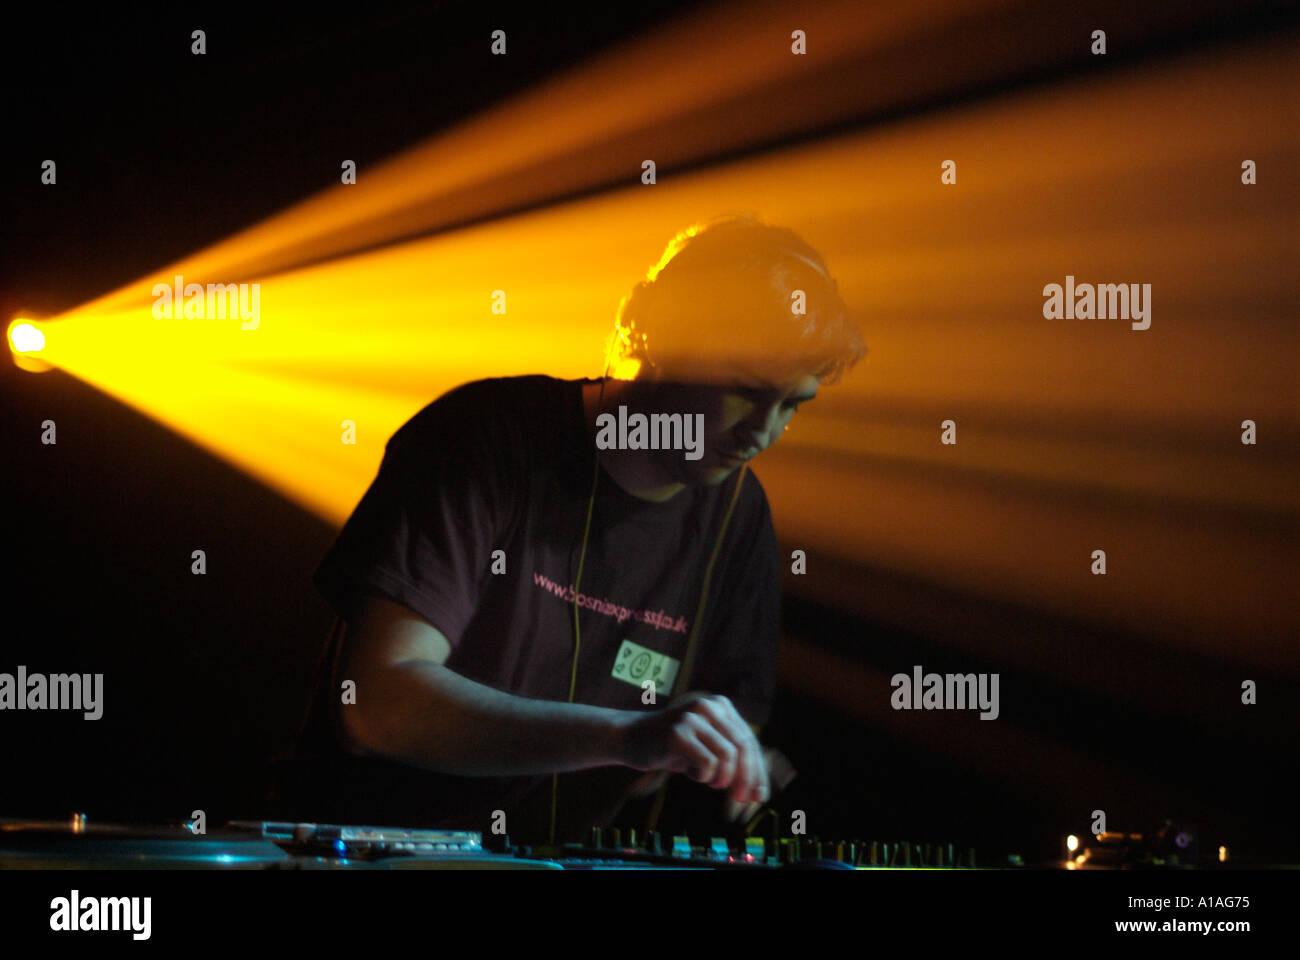 Nightclub Disc Jockey - Stock Image